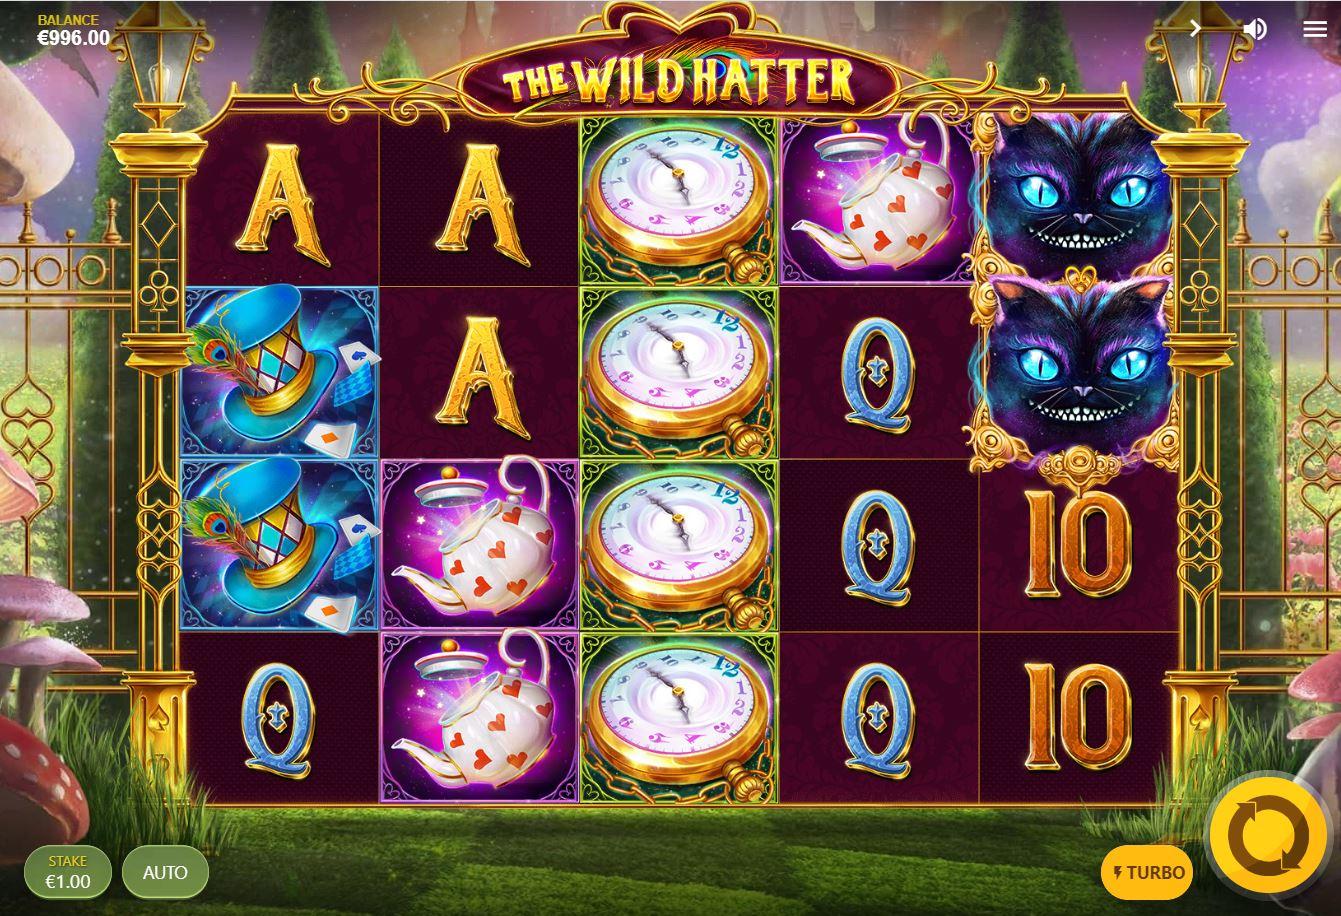 Spiele The Wild Hatter - Video Slots Online